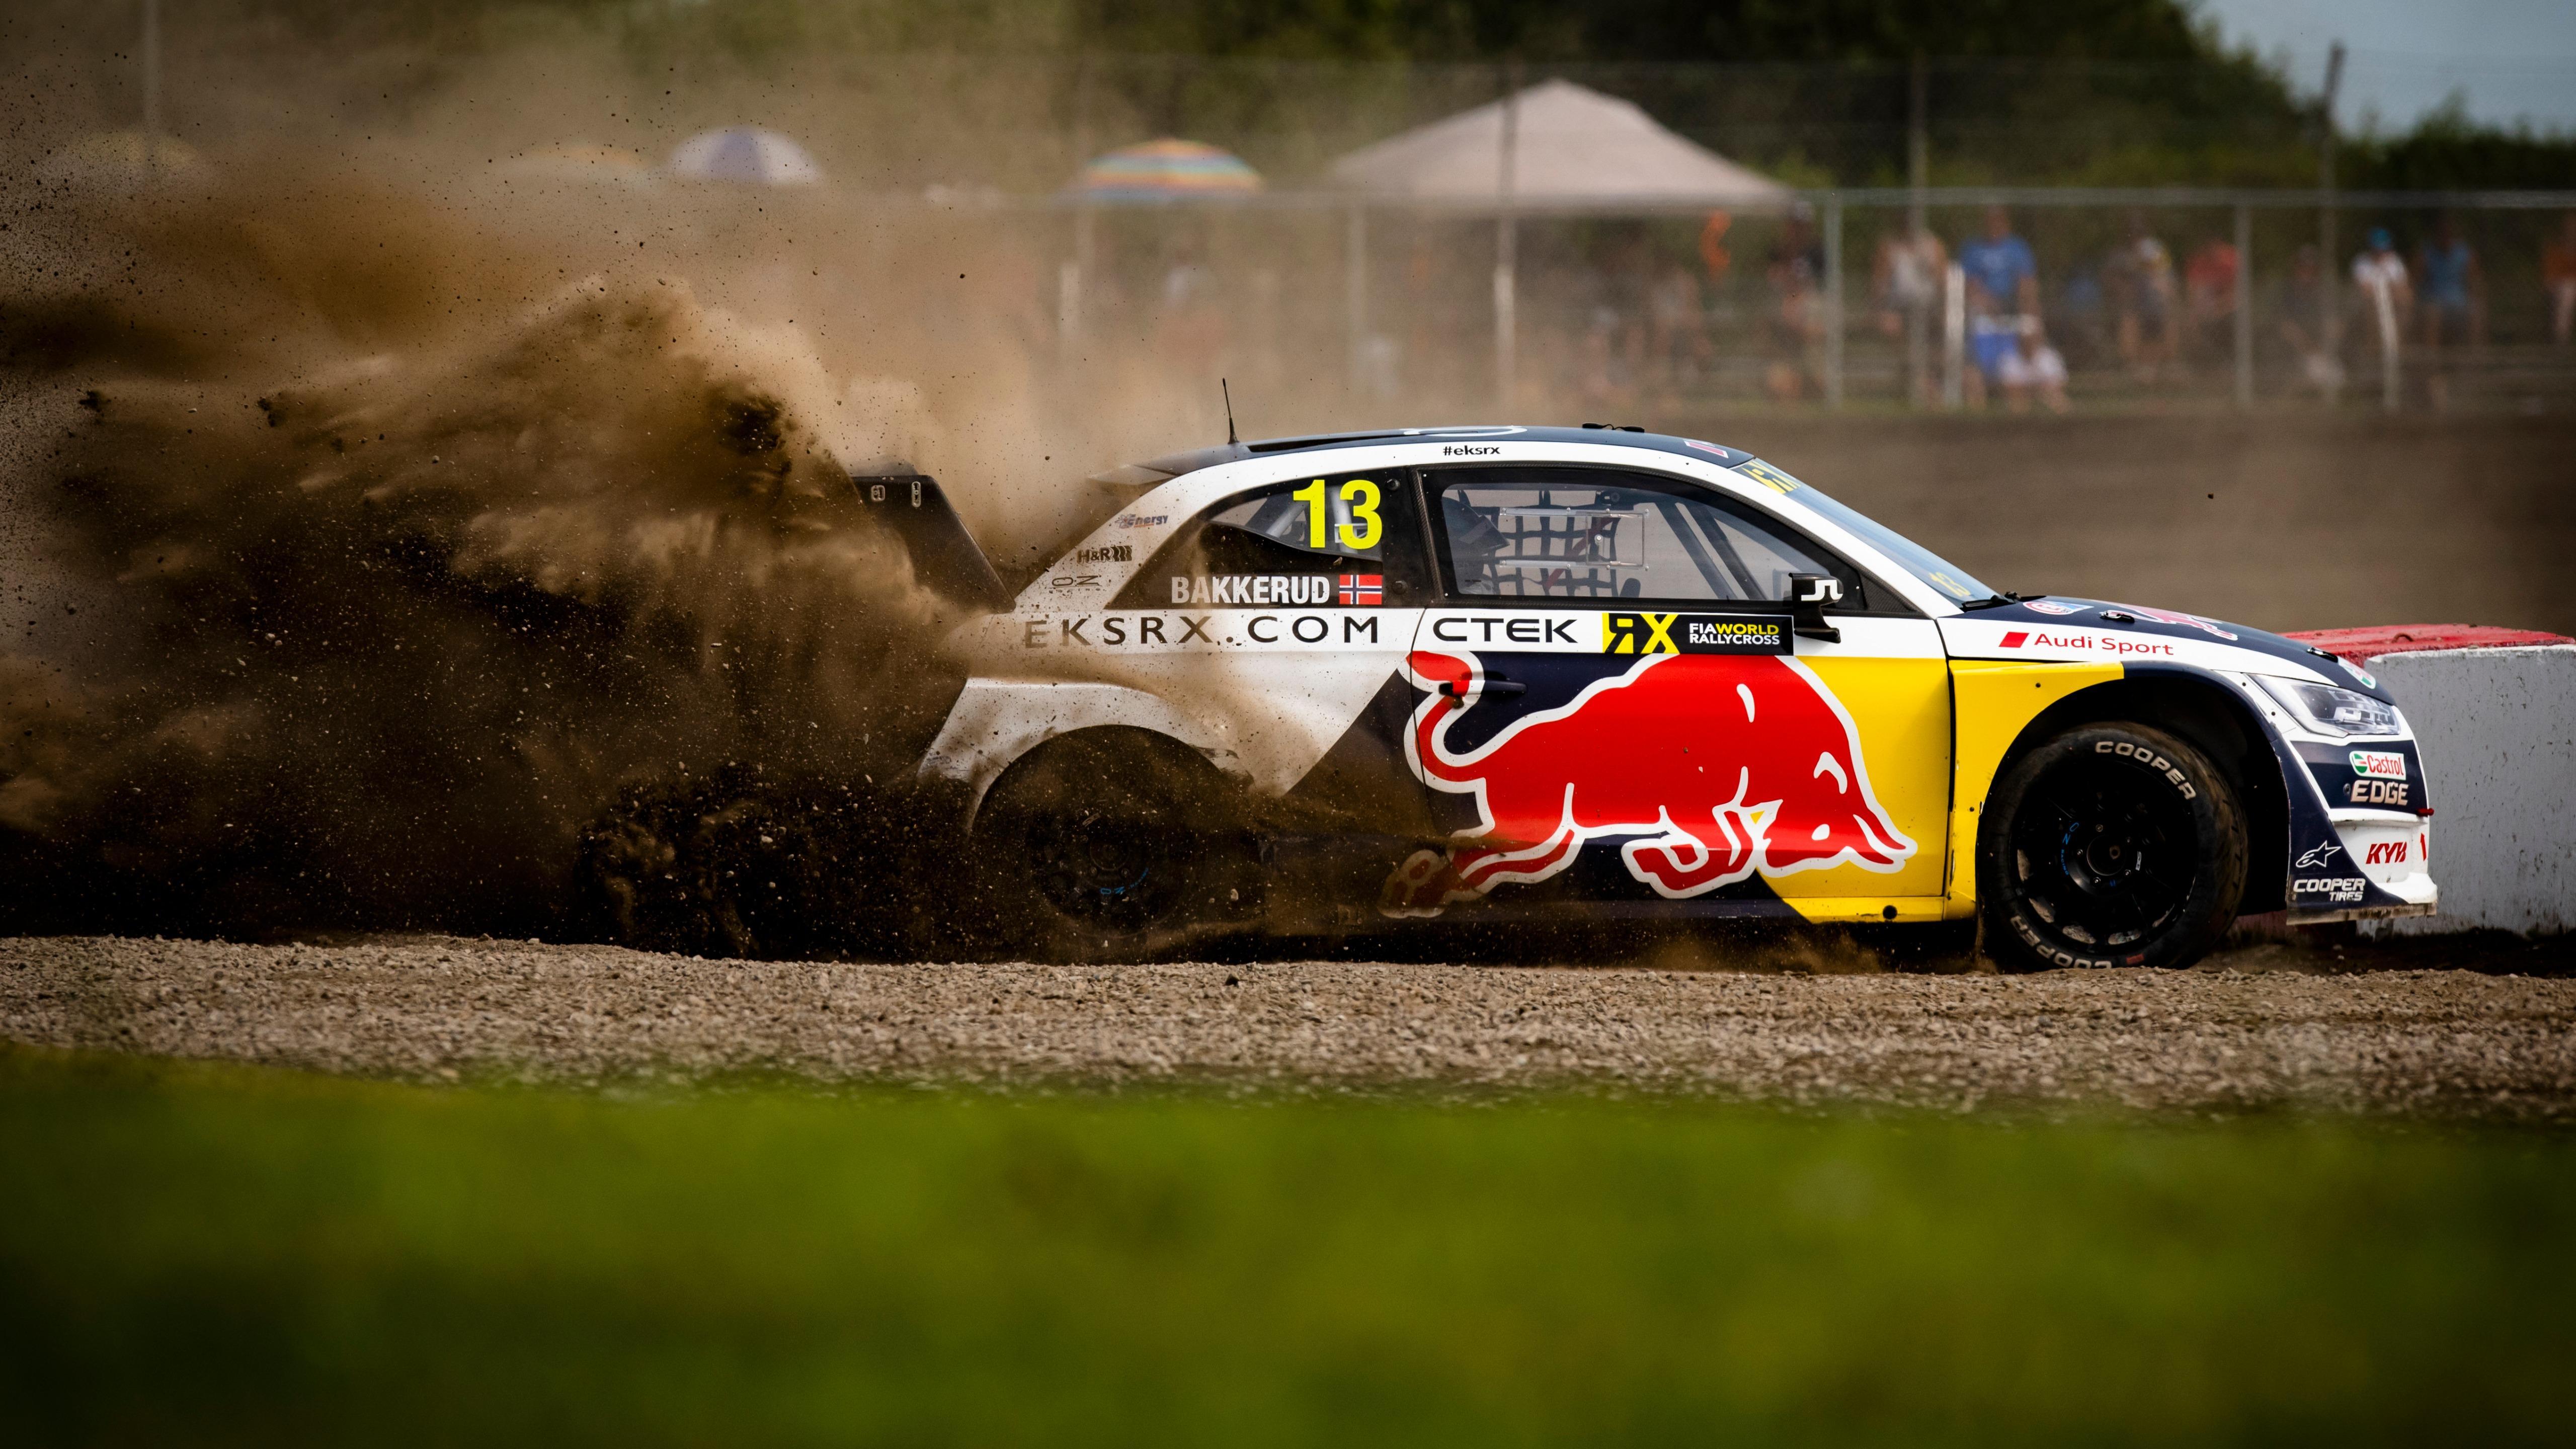 2018 FIA World Rallycross Championship Round 7 wallpaper